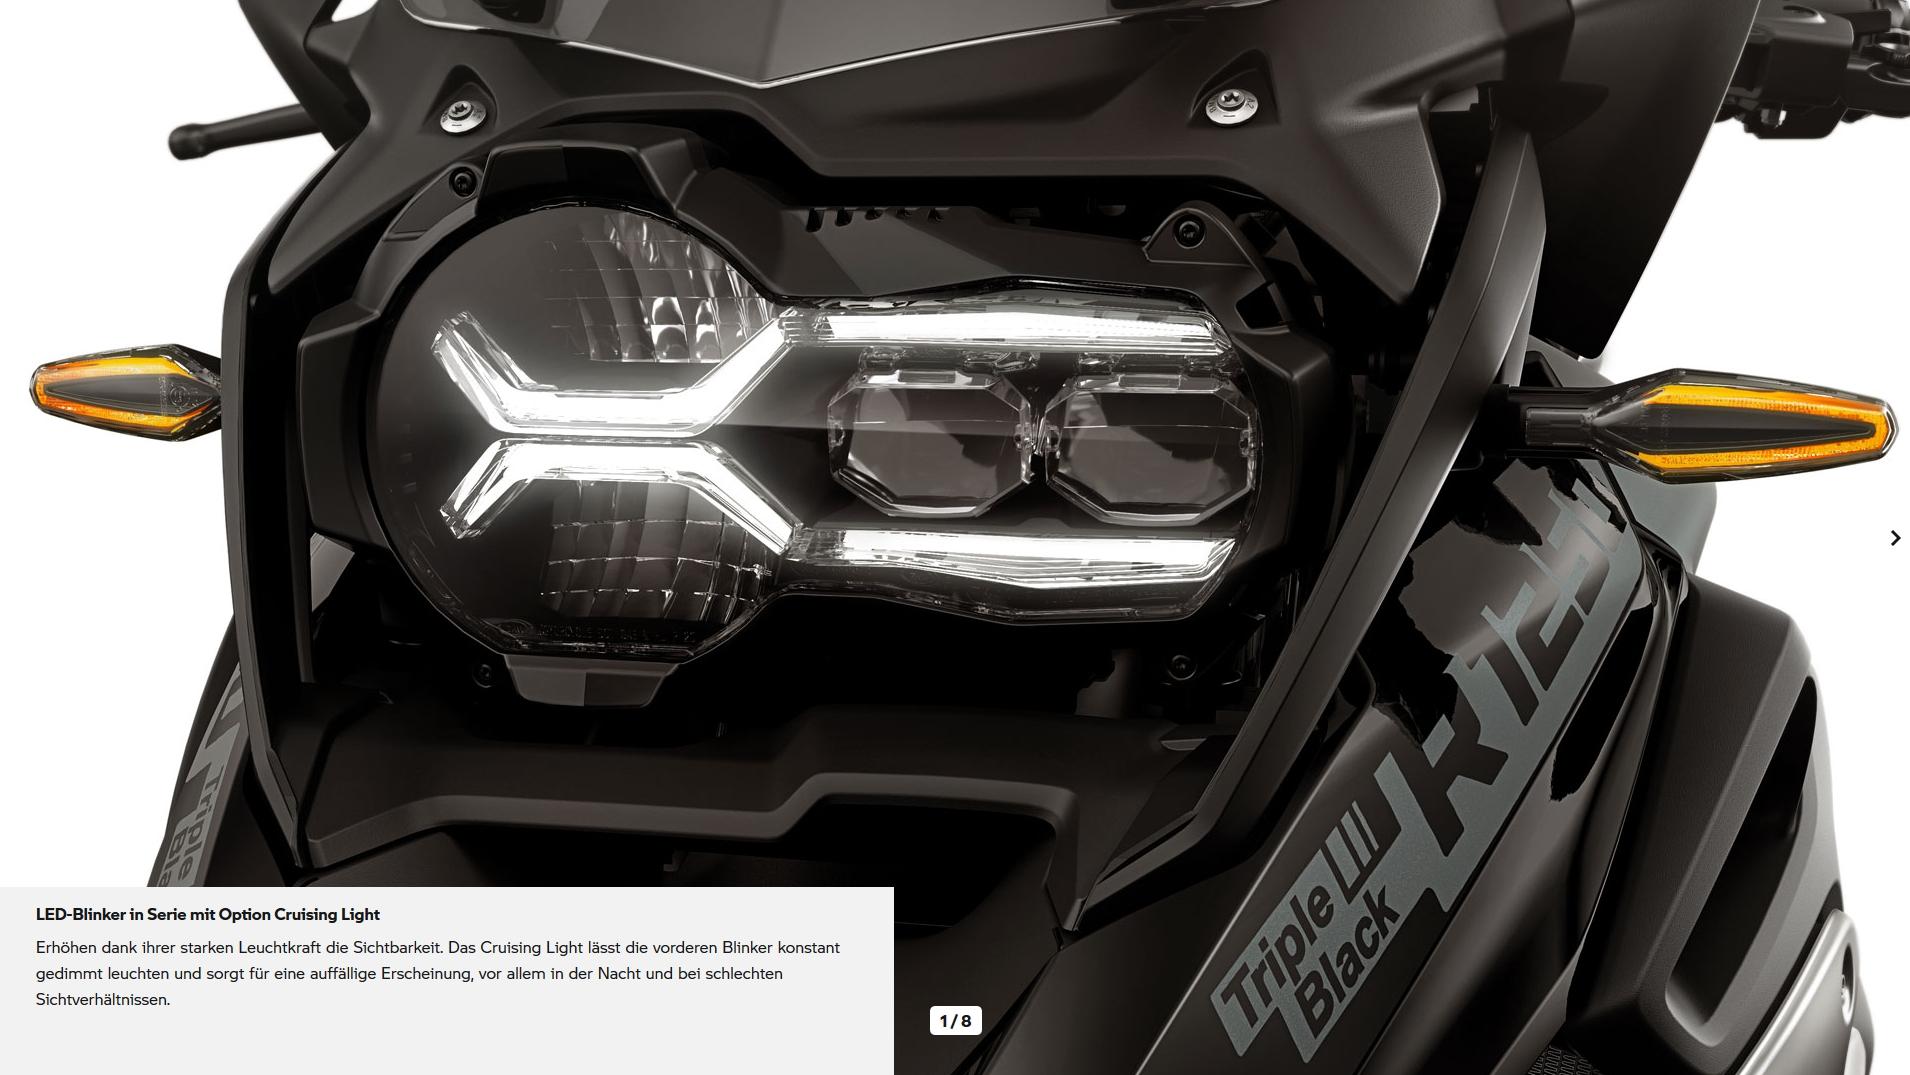 cruising_lights_BMW.jpg